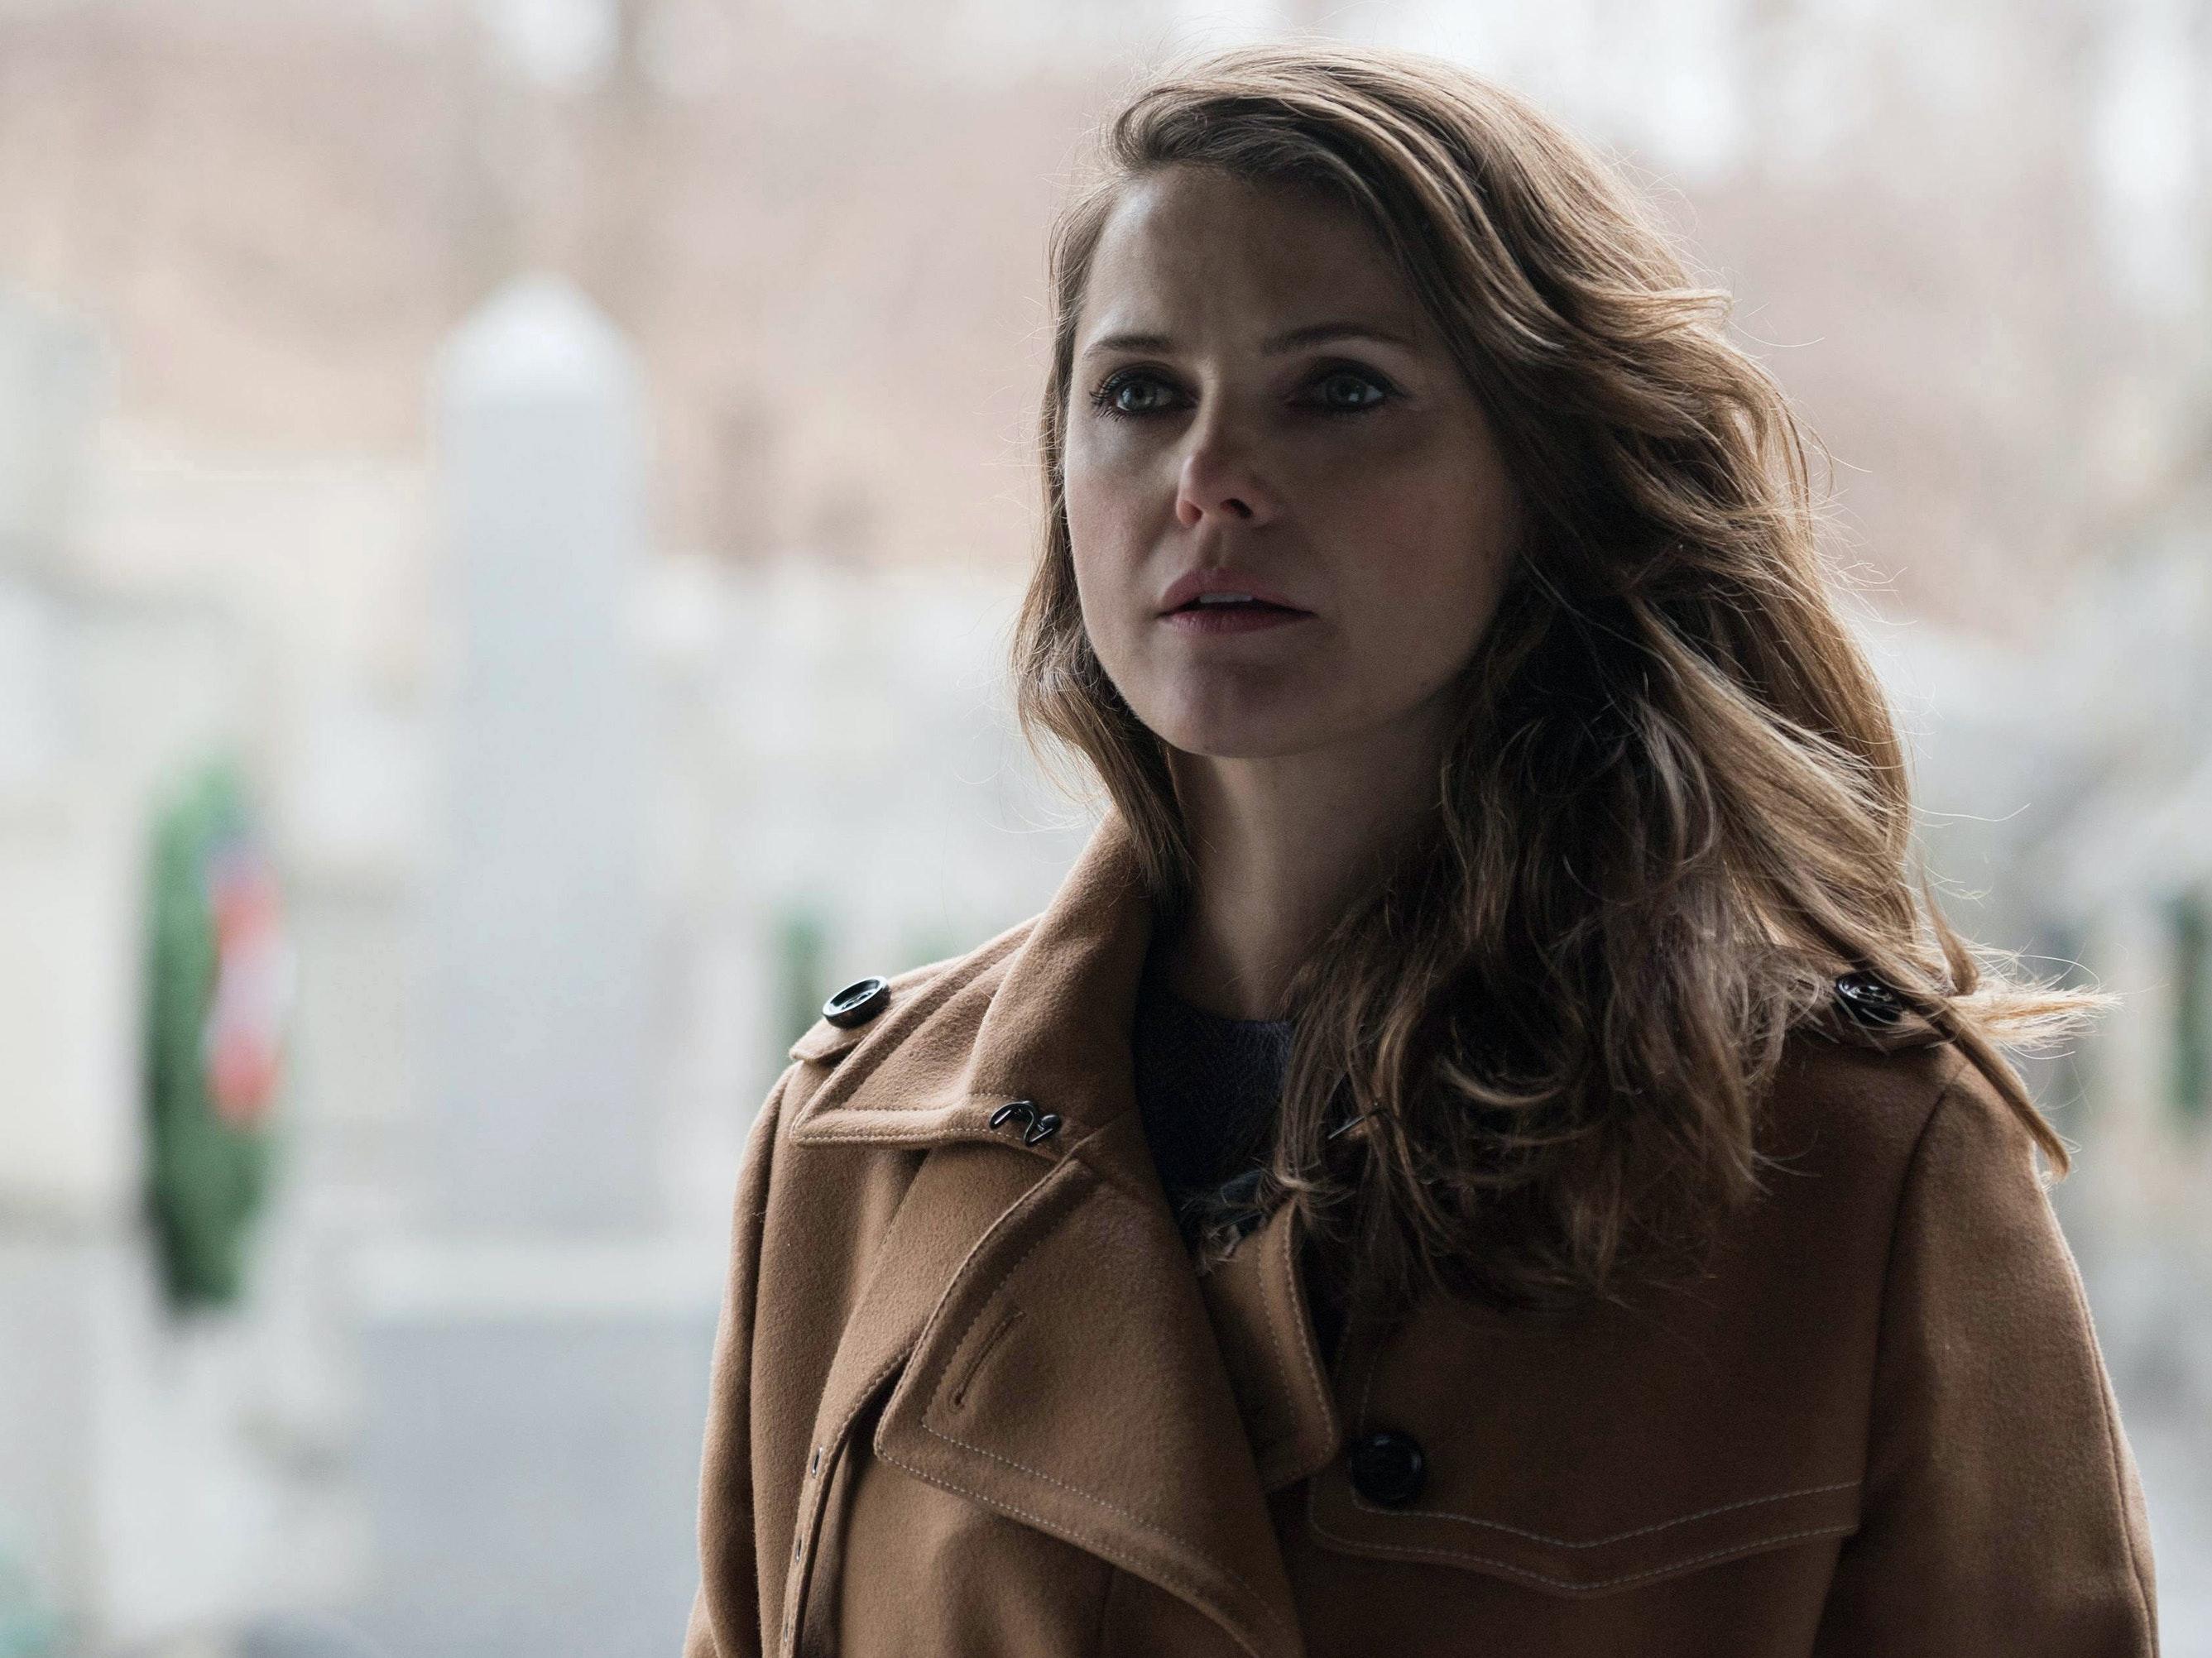 'The Americans' Season 4 Finale: EST Revelations, Lassa, New Threats from Russia